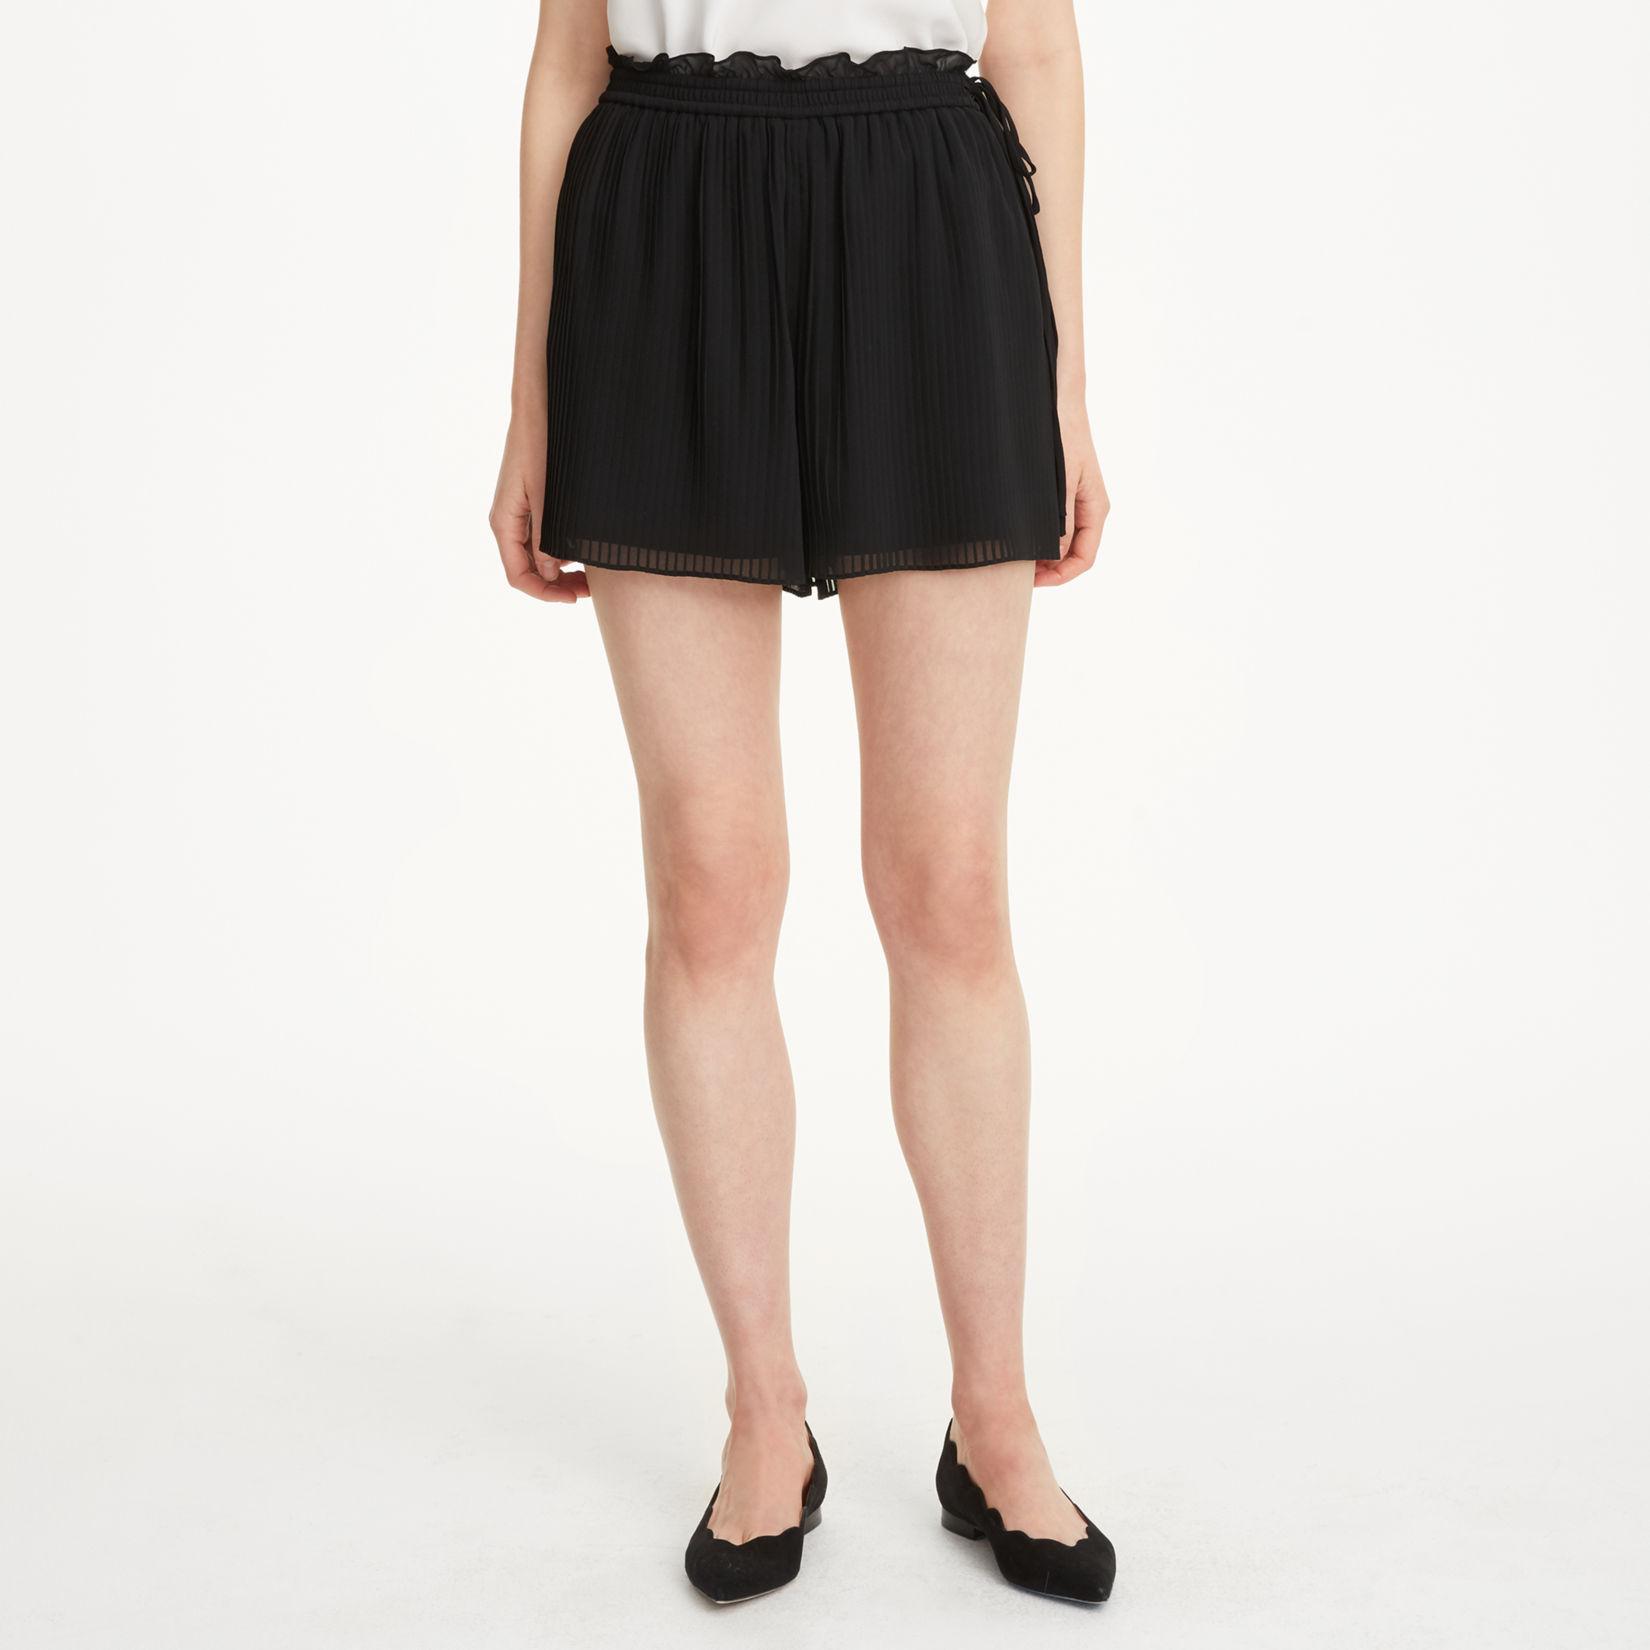 Women | Sale | Pants and Shorts | Club Monaco